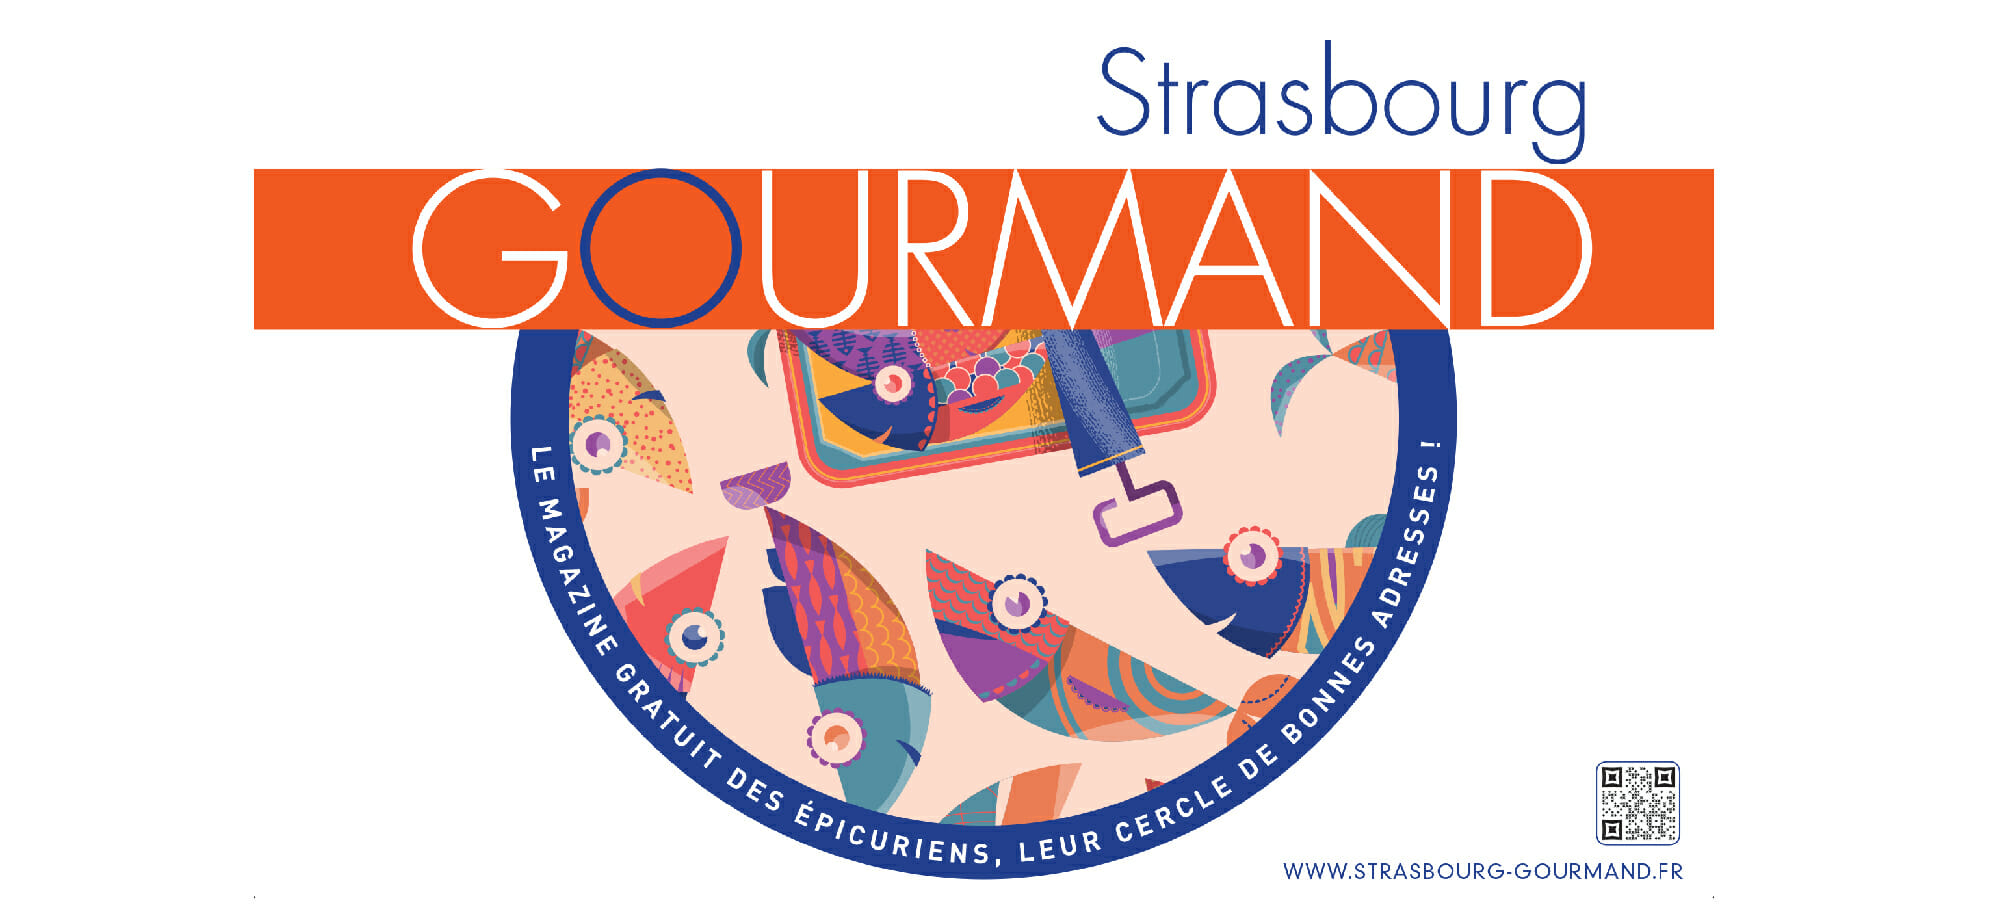 Strasbourg gourmand partenaire street bouche festival 3 septembre 2018 - Street Bouche